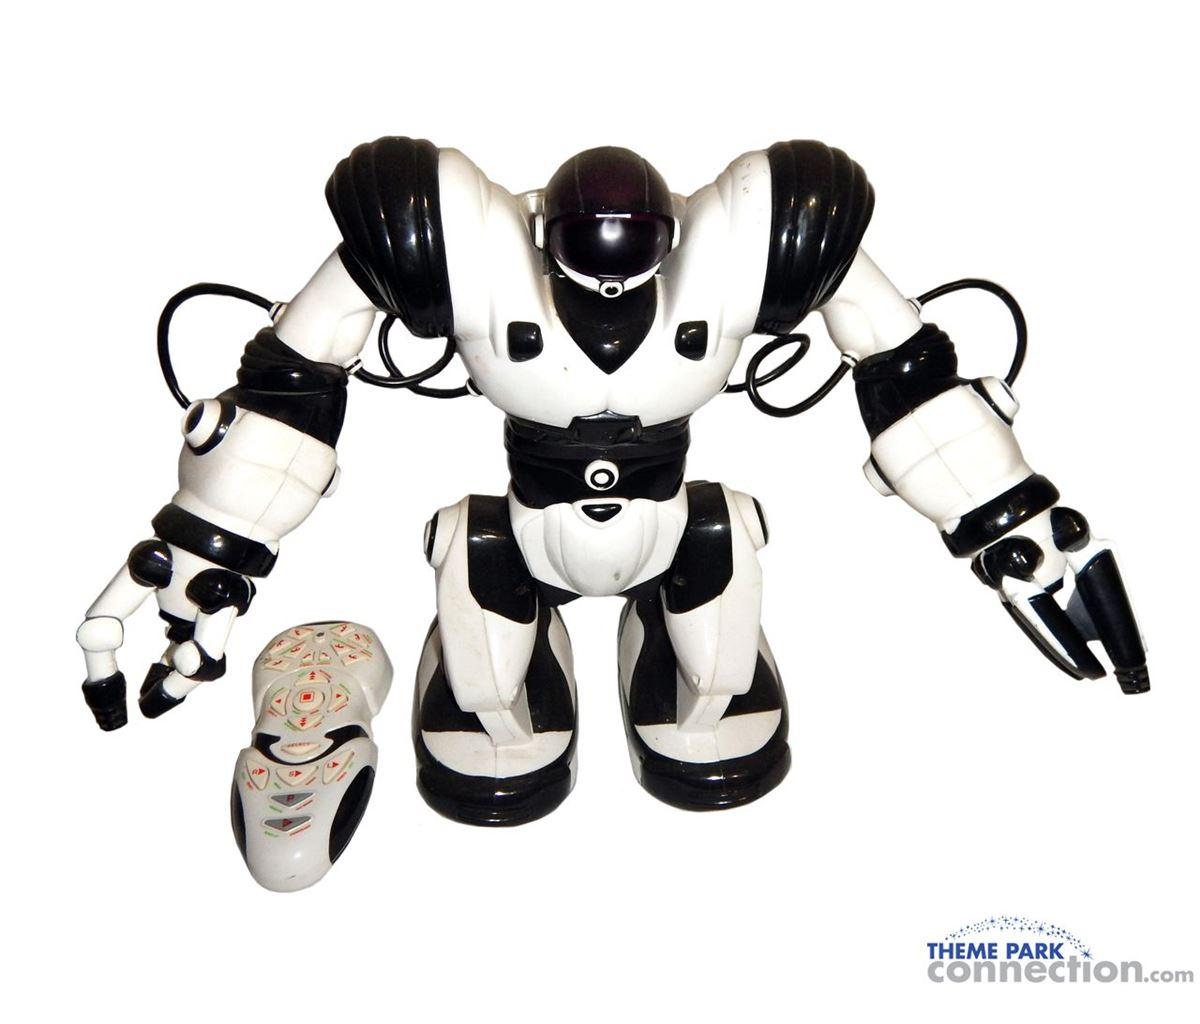 Paul Blart Mall Cop 2009 Movie Kevin James Screen Used Wowwee Robosapien Prop Robot